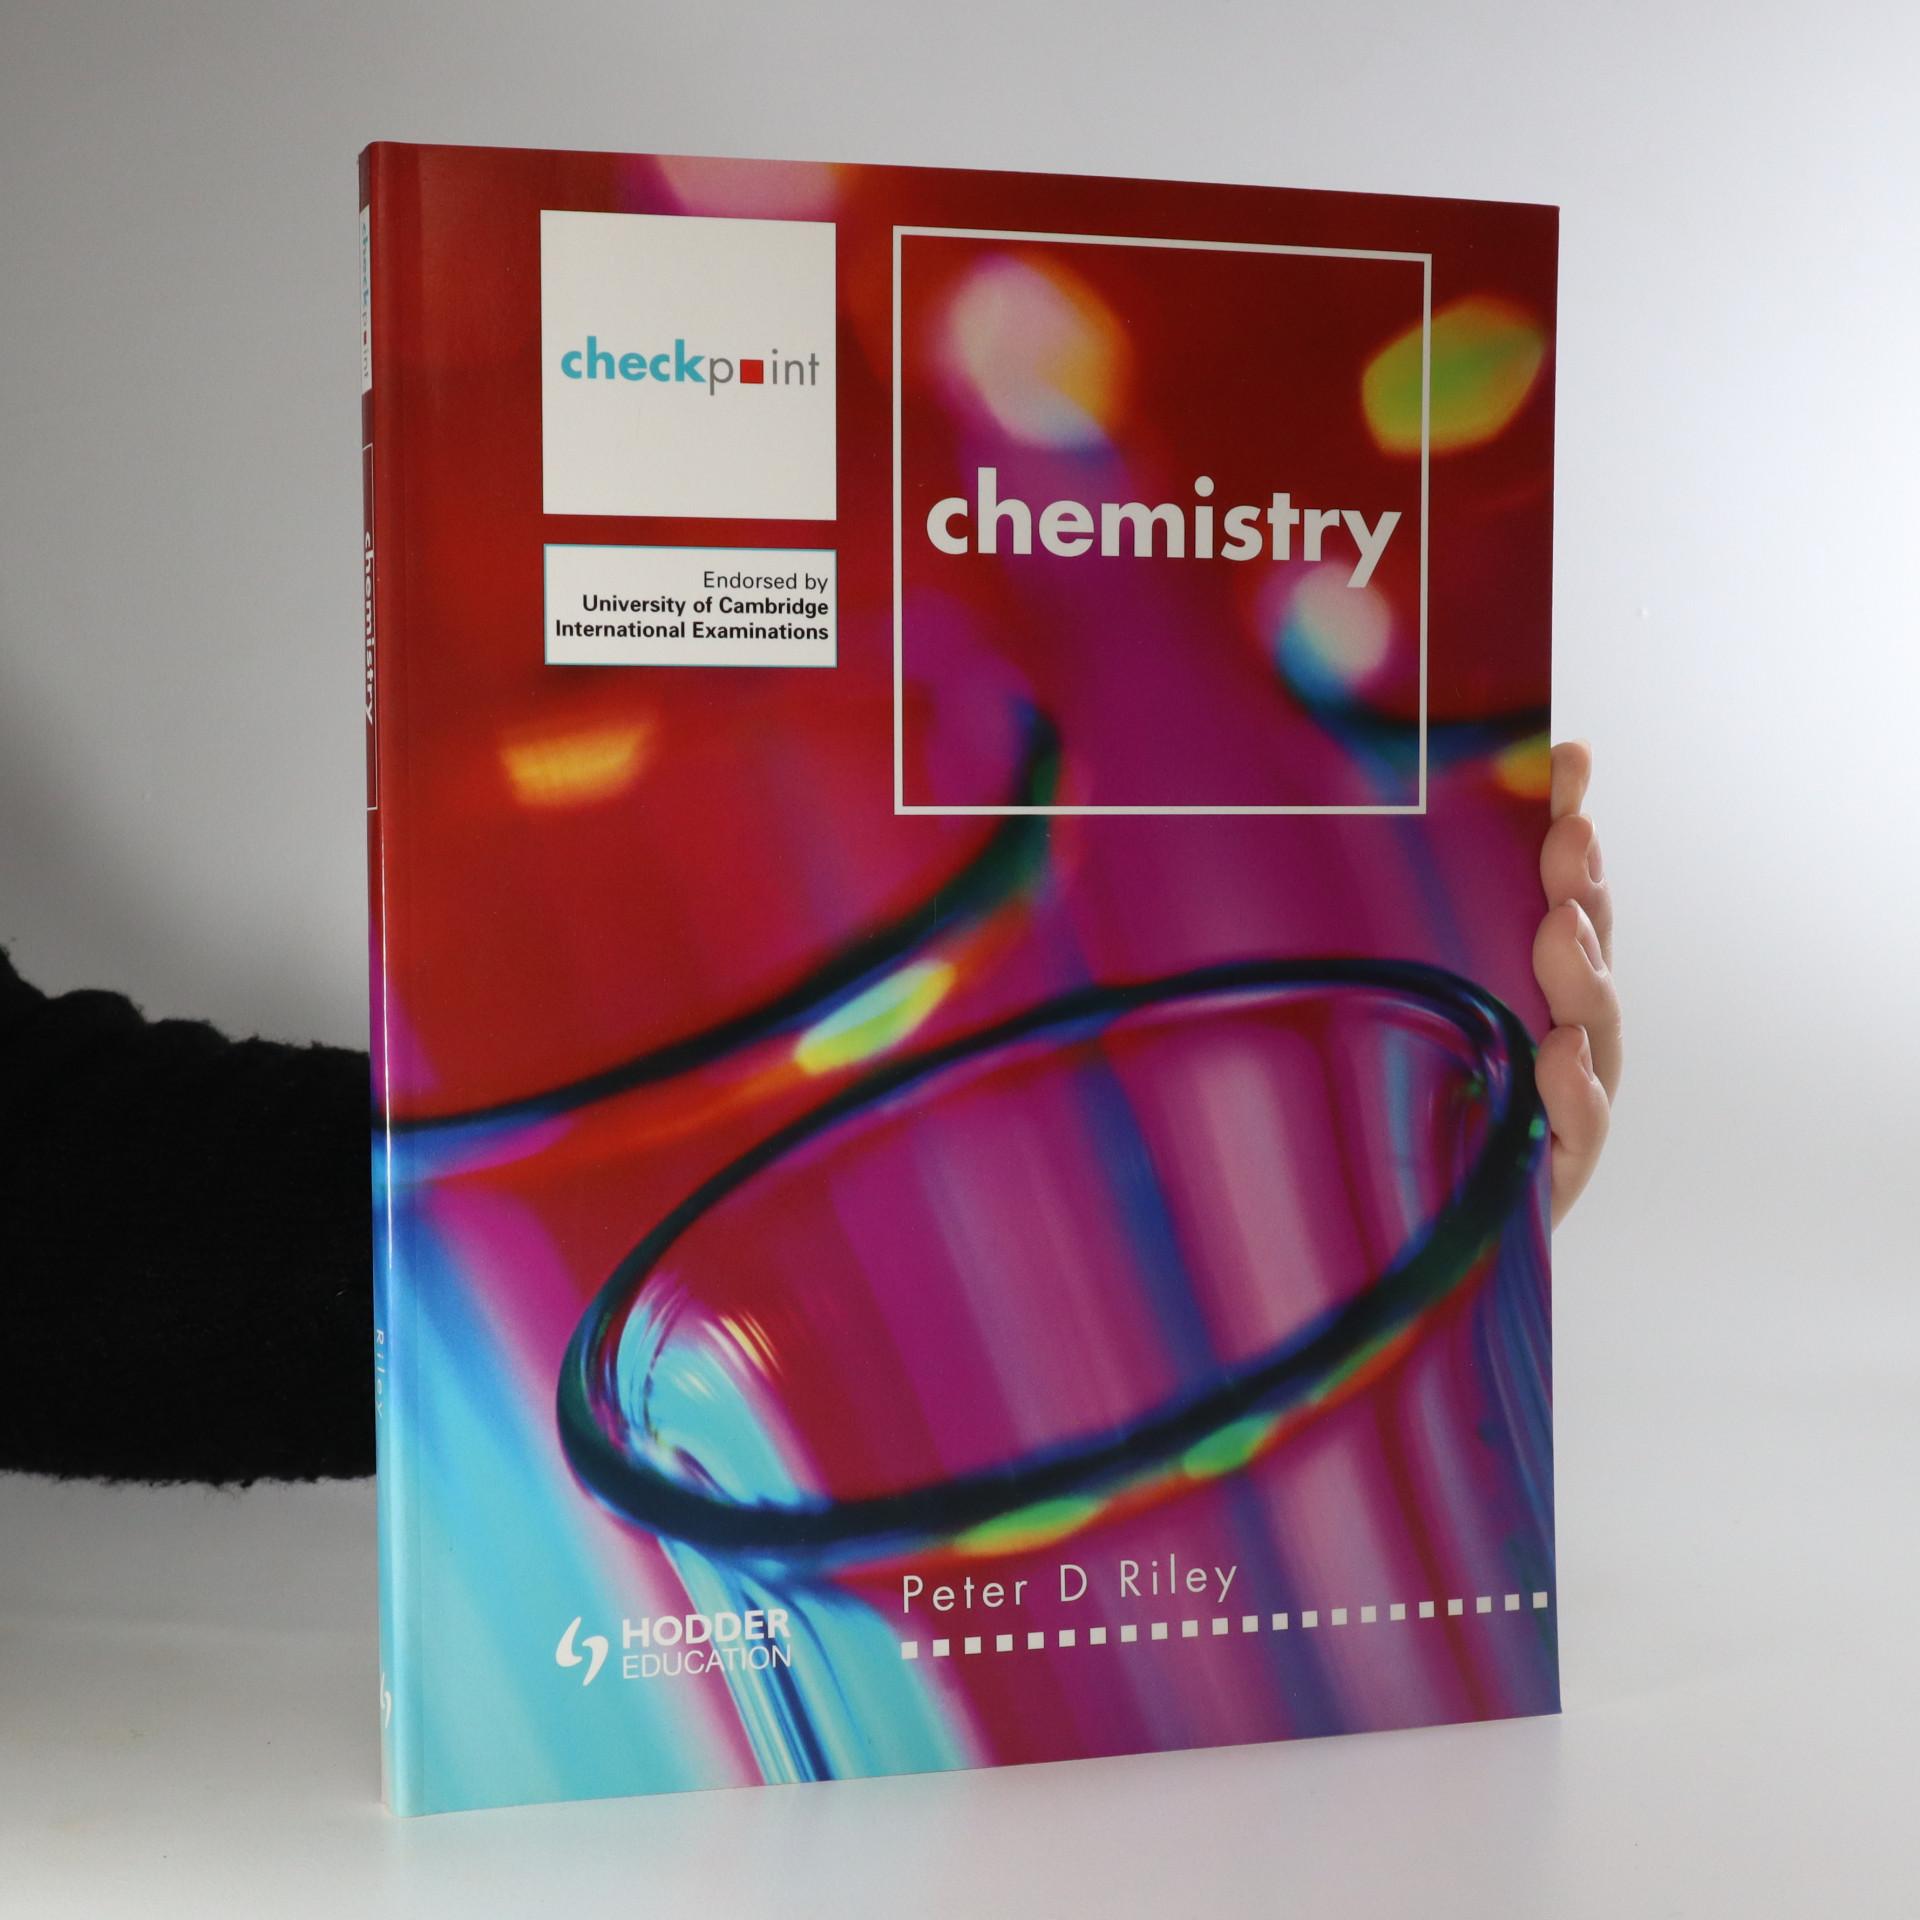 antikvární kniha Checkpoint Chemistry, 2005